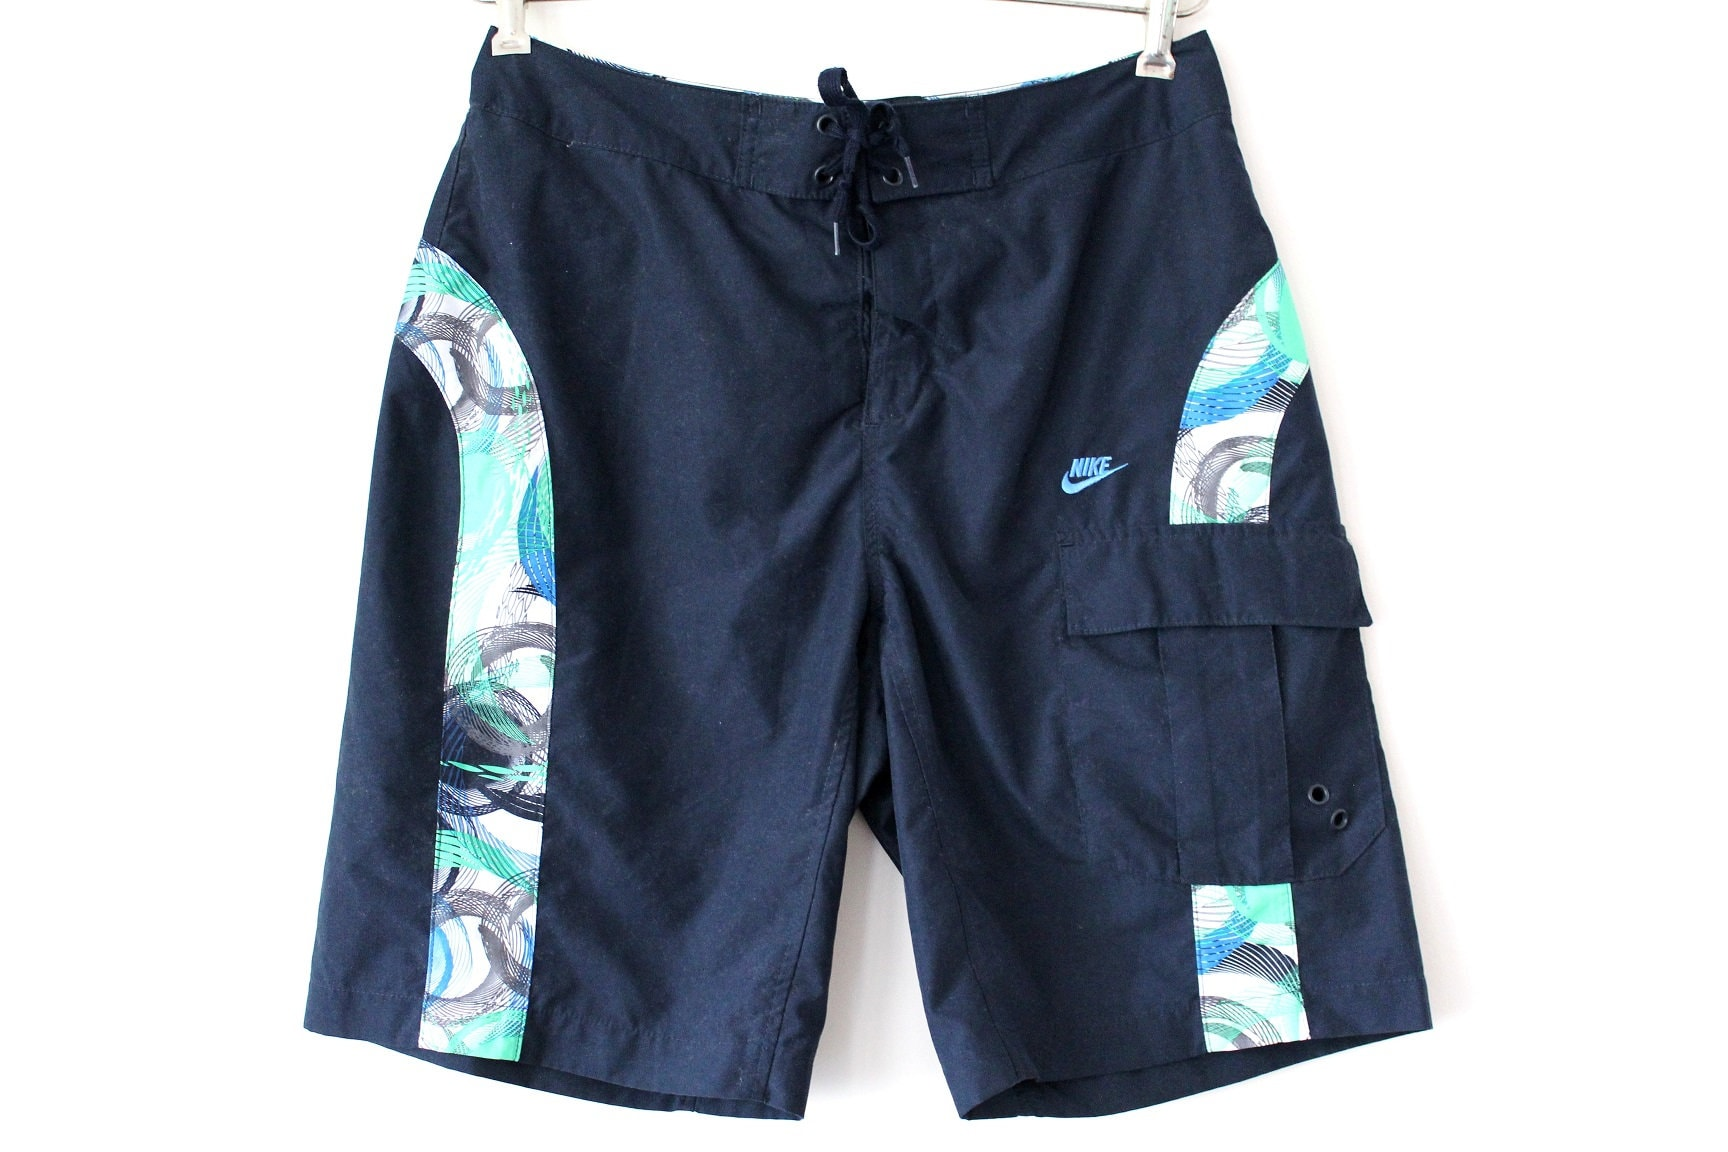 Decano Incontable préstamo  90's Nike Shorts Vintage Nike Sport Bottoms Blue Nike   Etsy